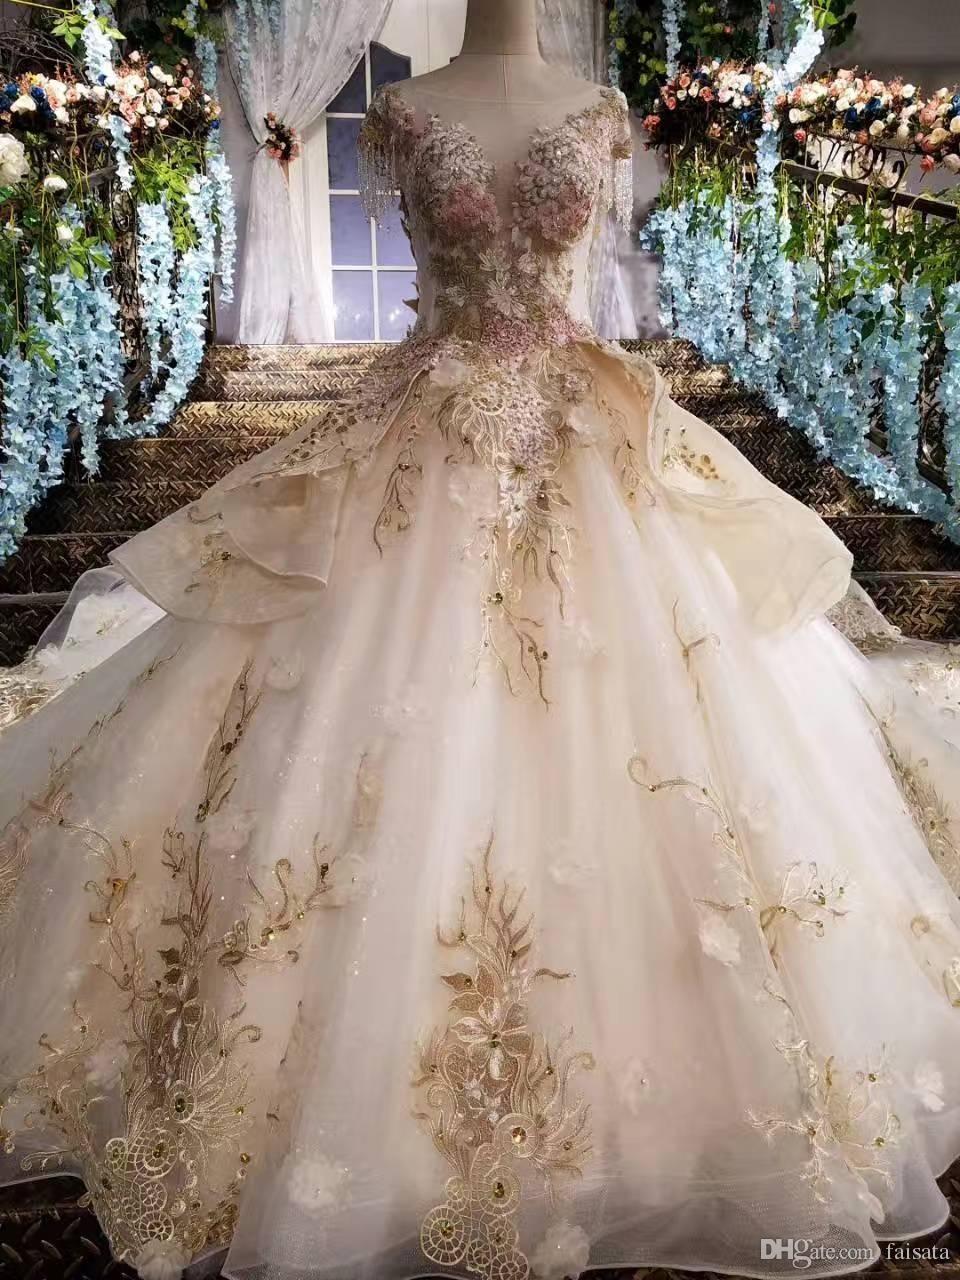 Colors Wedding Dresses 2017 Ball Gown Arabic Wedding Dress Vintage Lace  Champagne Gold Wedding Dresses Luxurious Style Bridal Dresses b5e3c53e0c4b